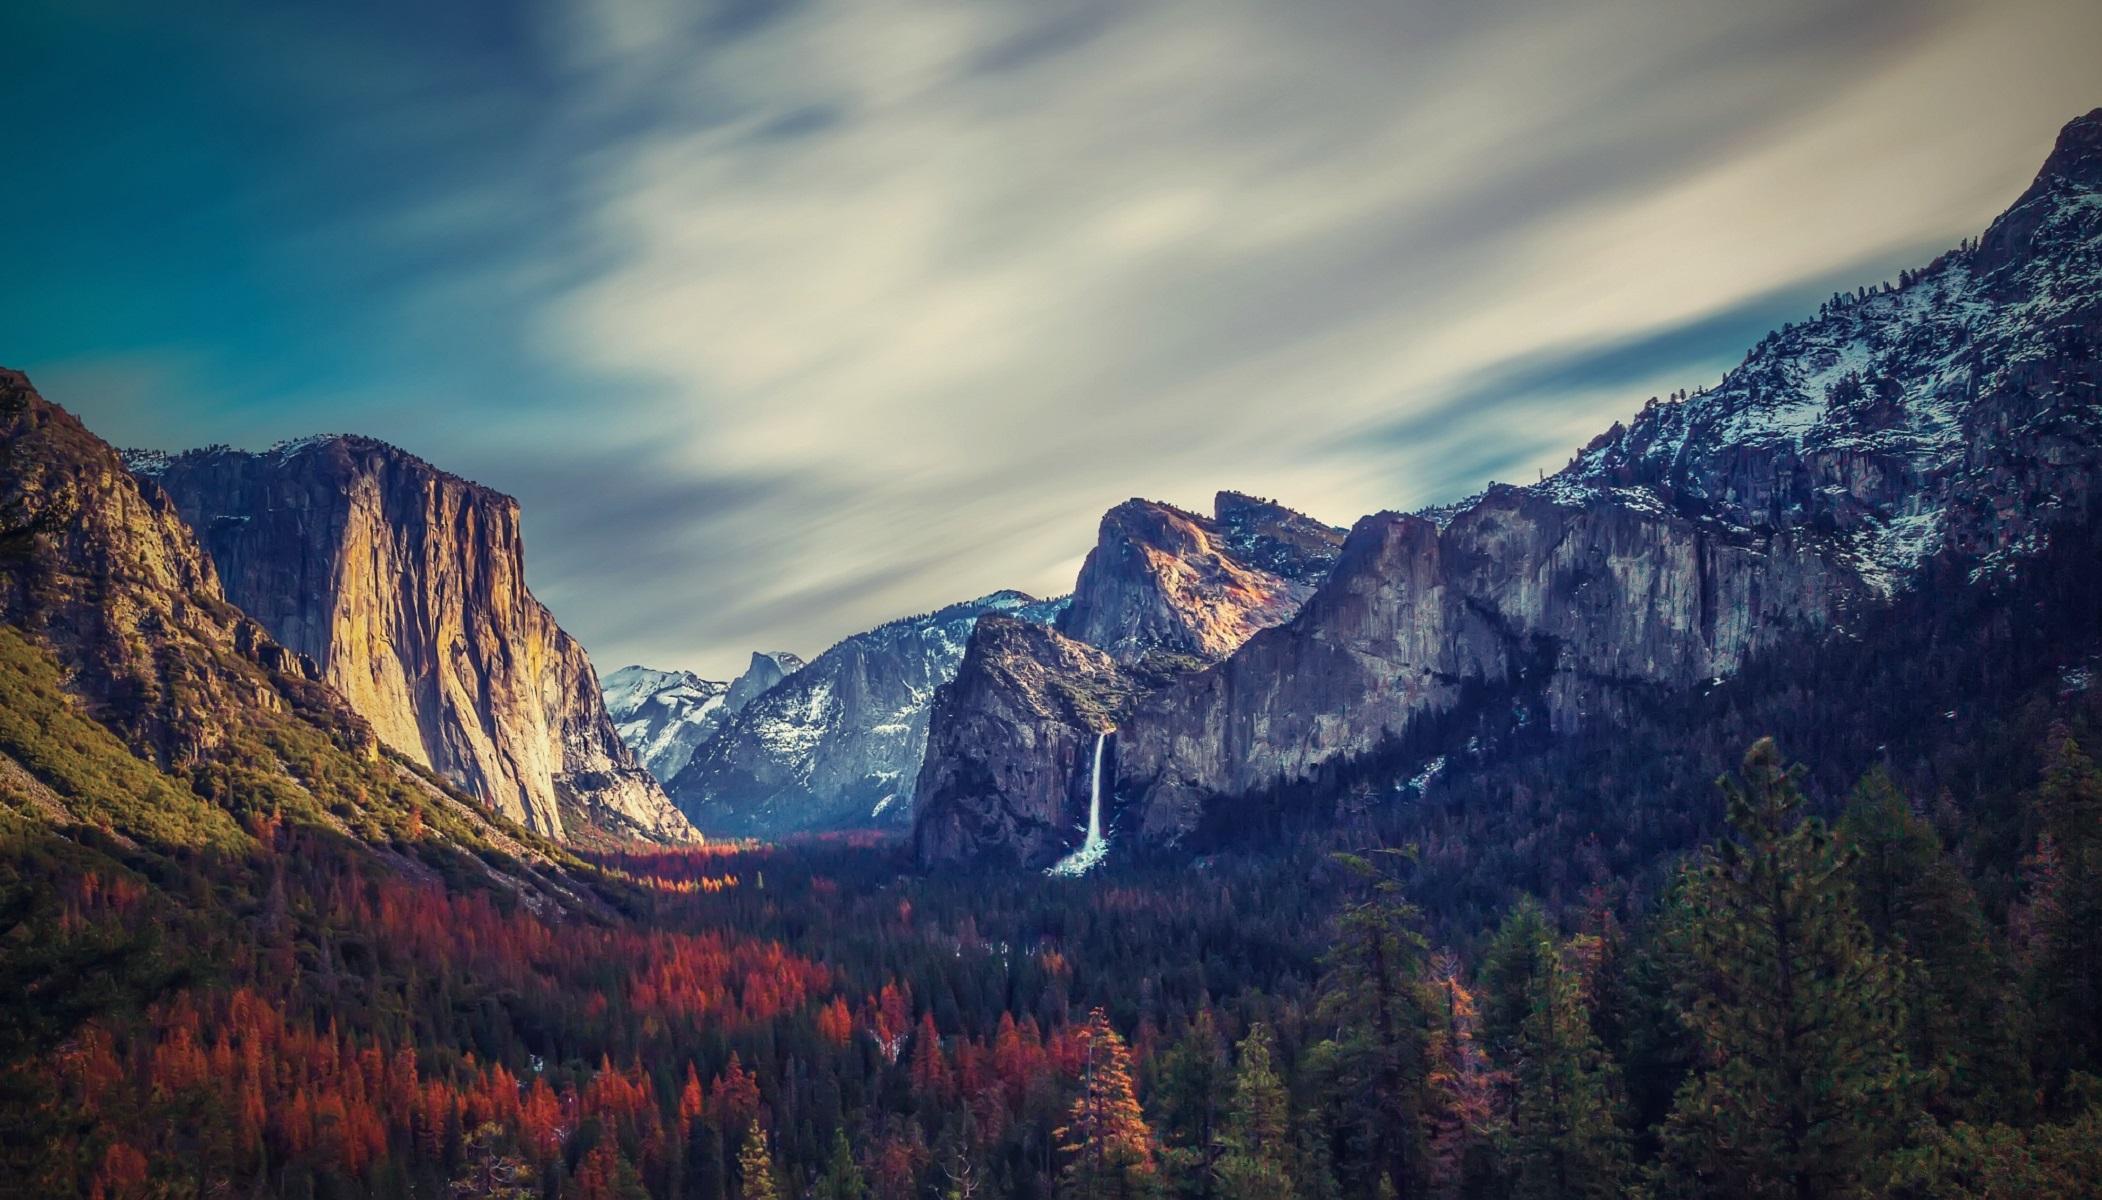 Yosemite Valley Wallpaper Background